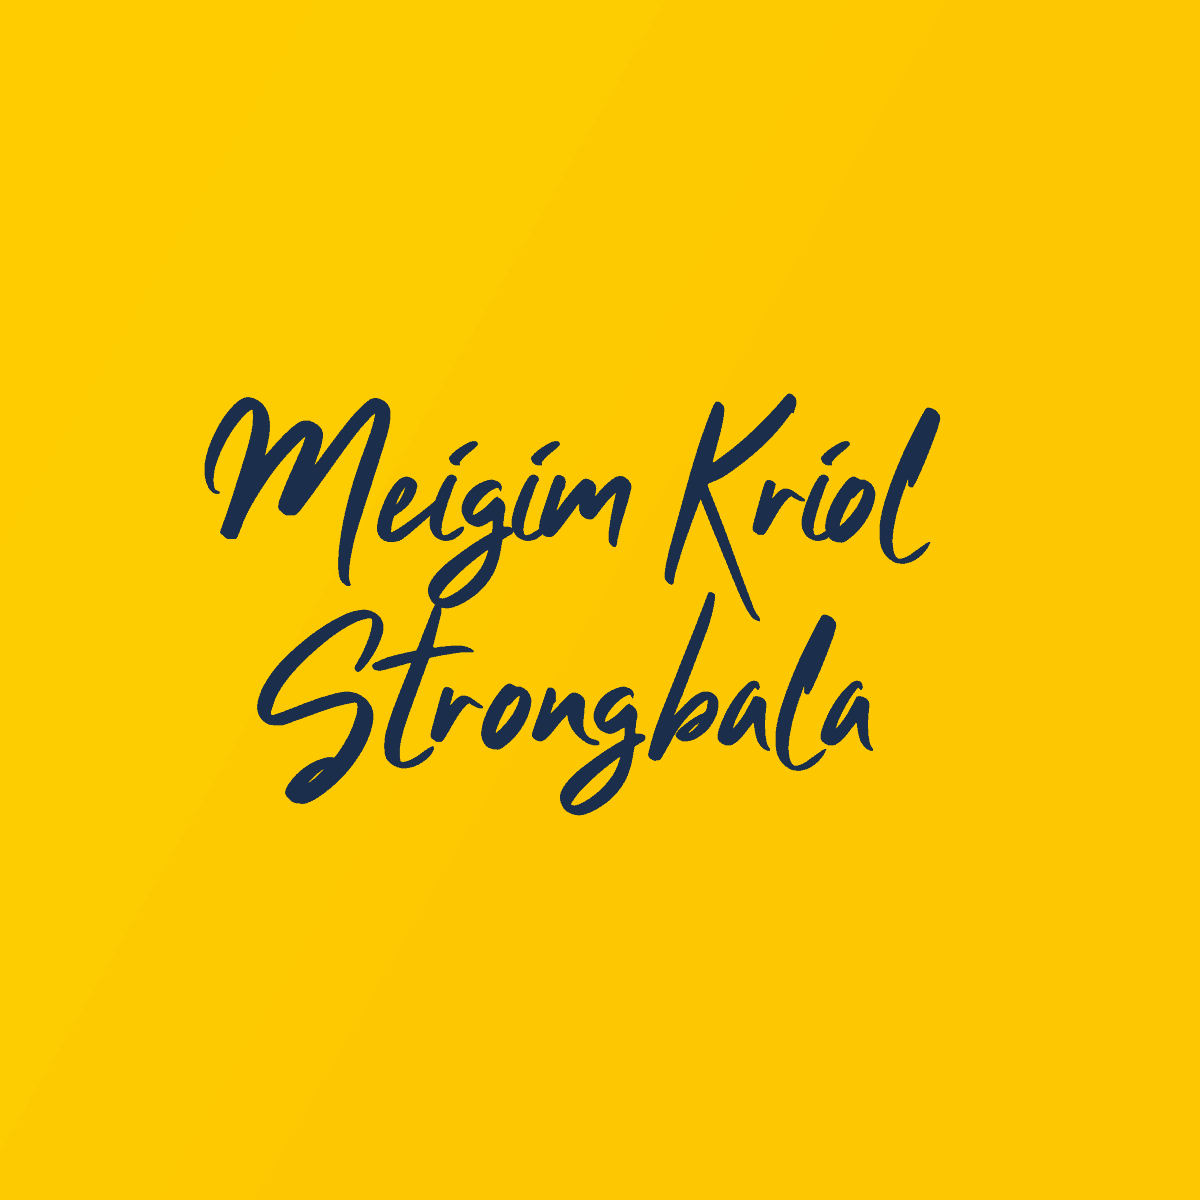 Meigim Kriol Strongbala